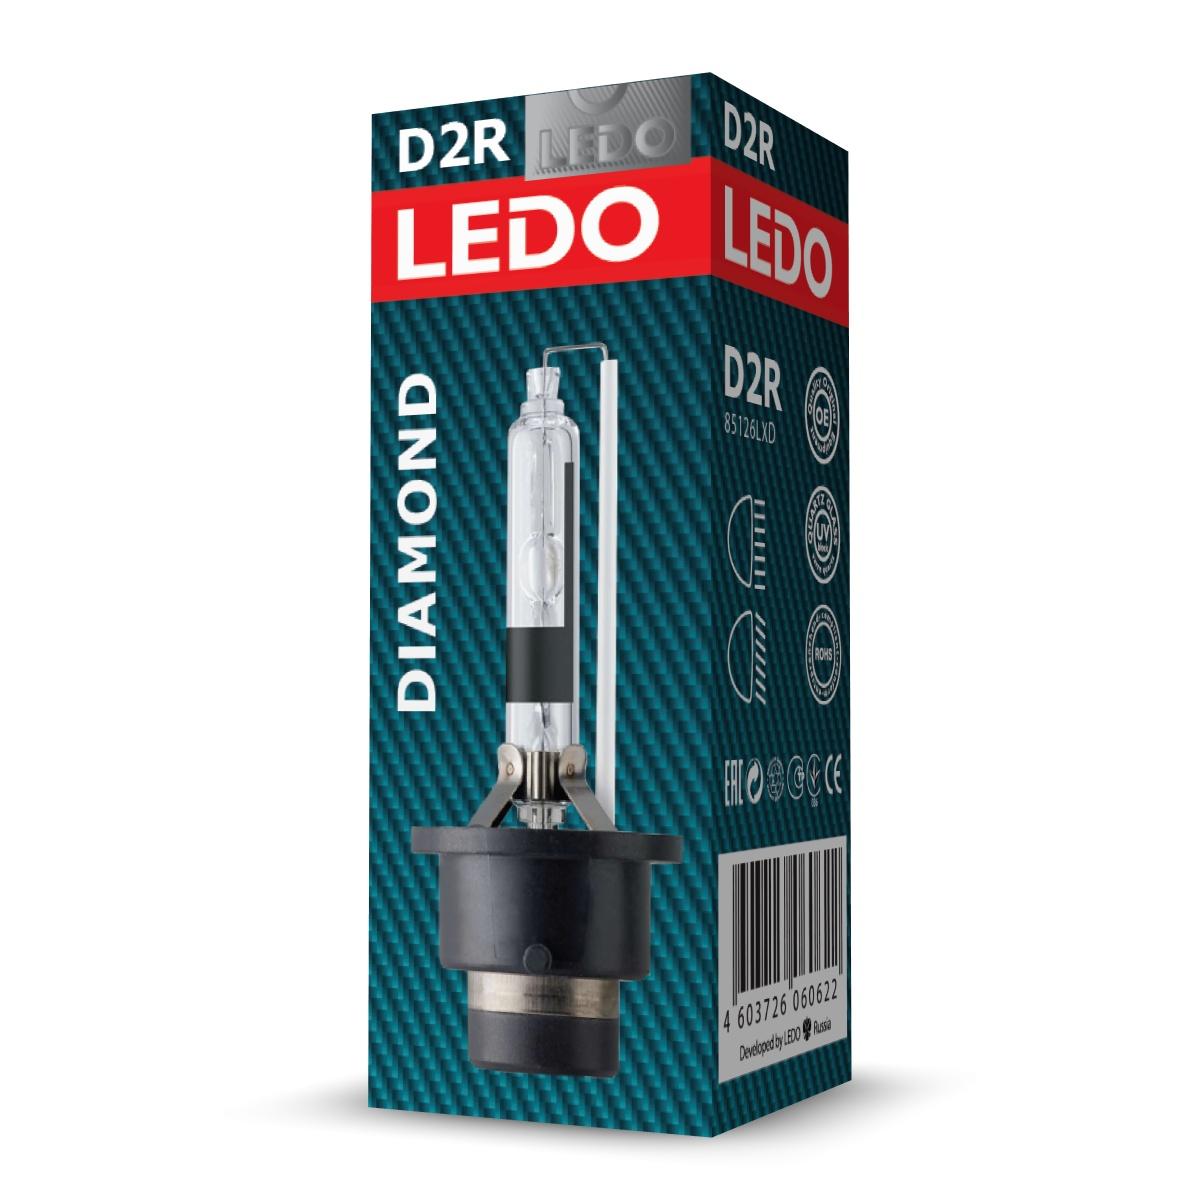 Лампа D2R 5000К LEDO Diamond